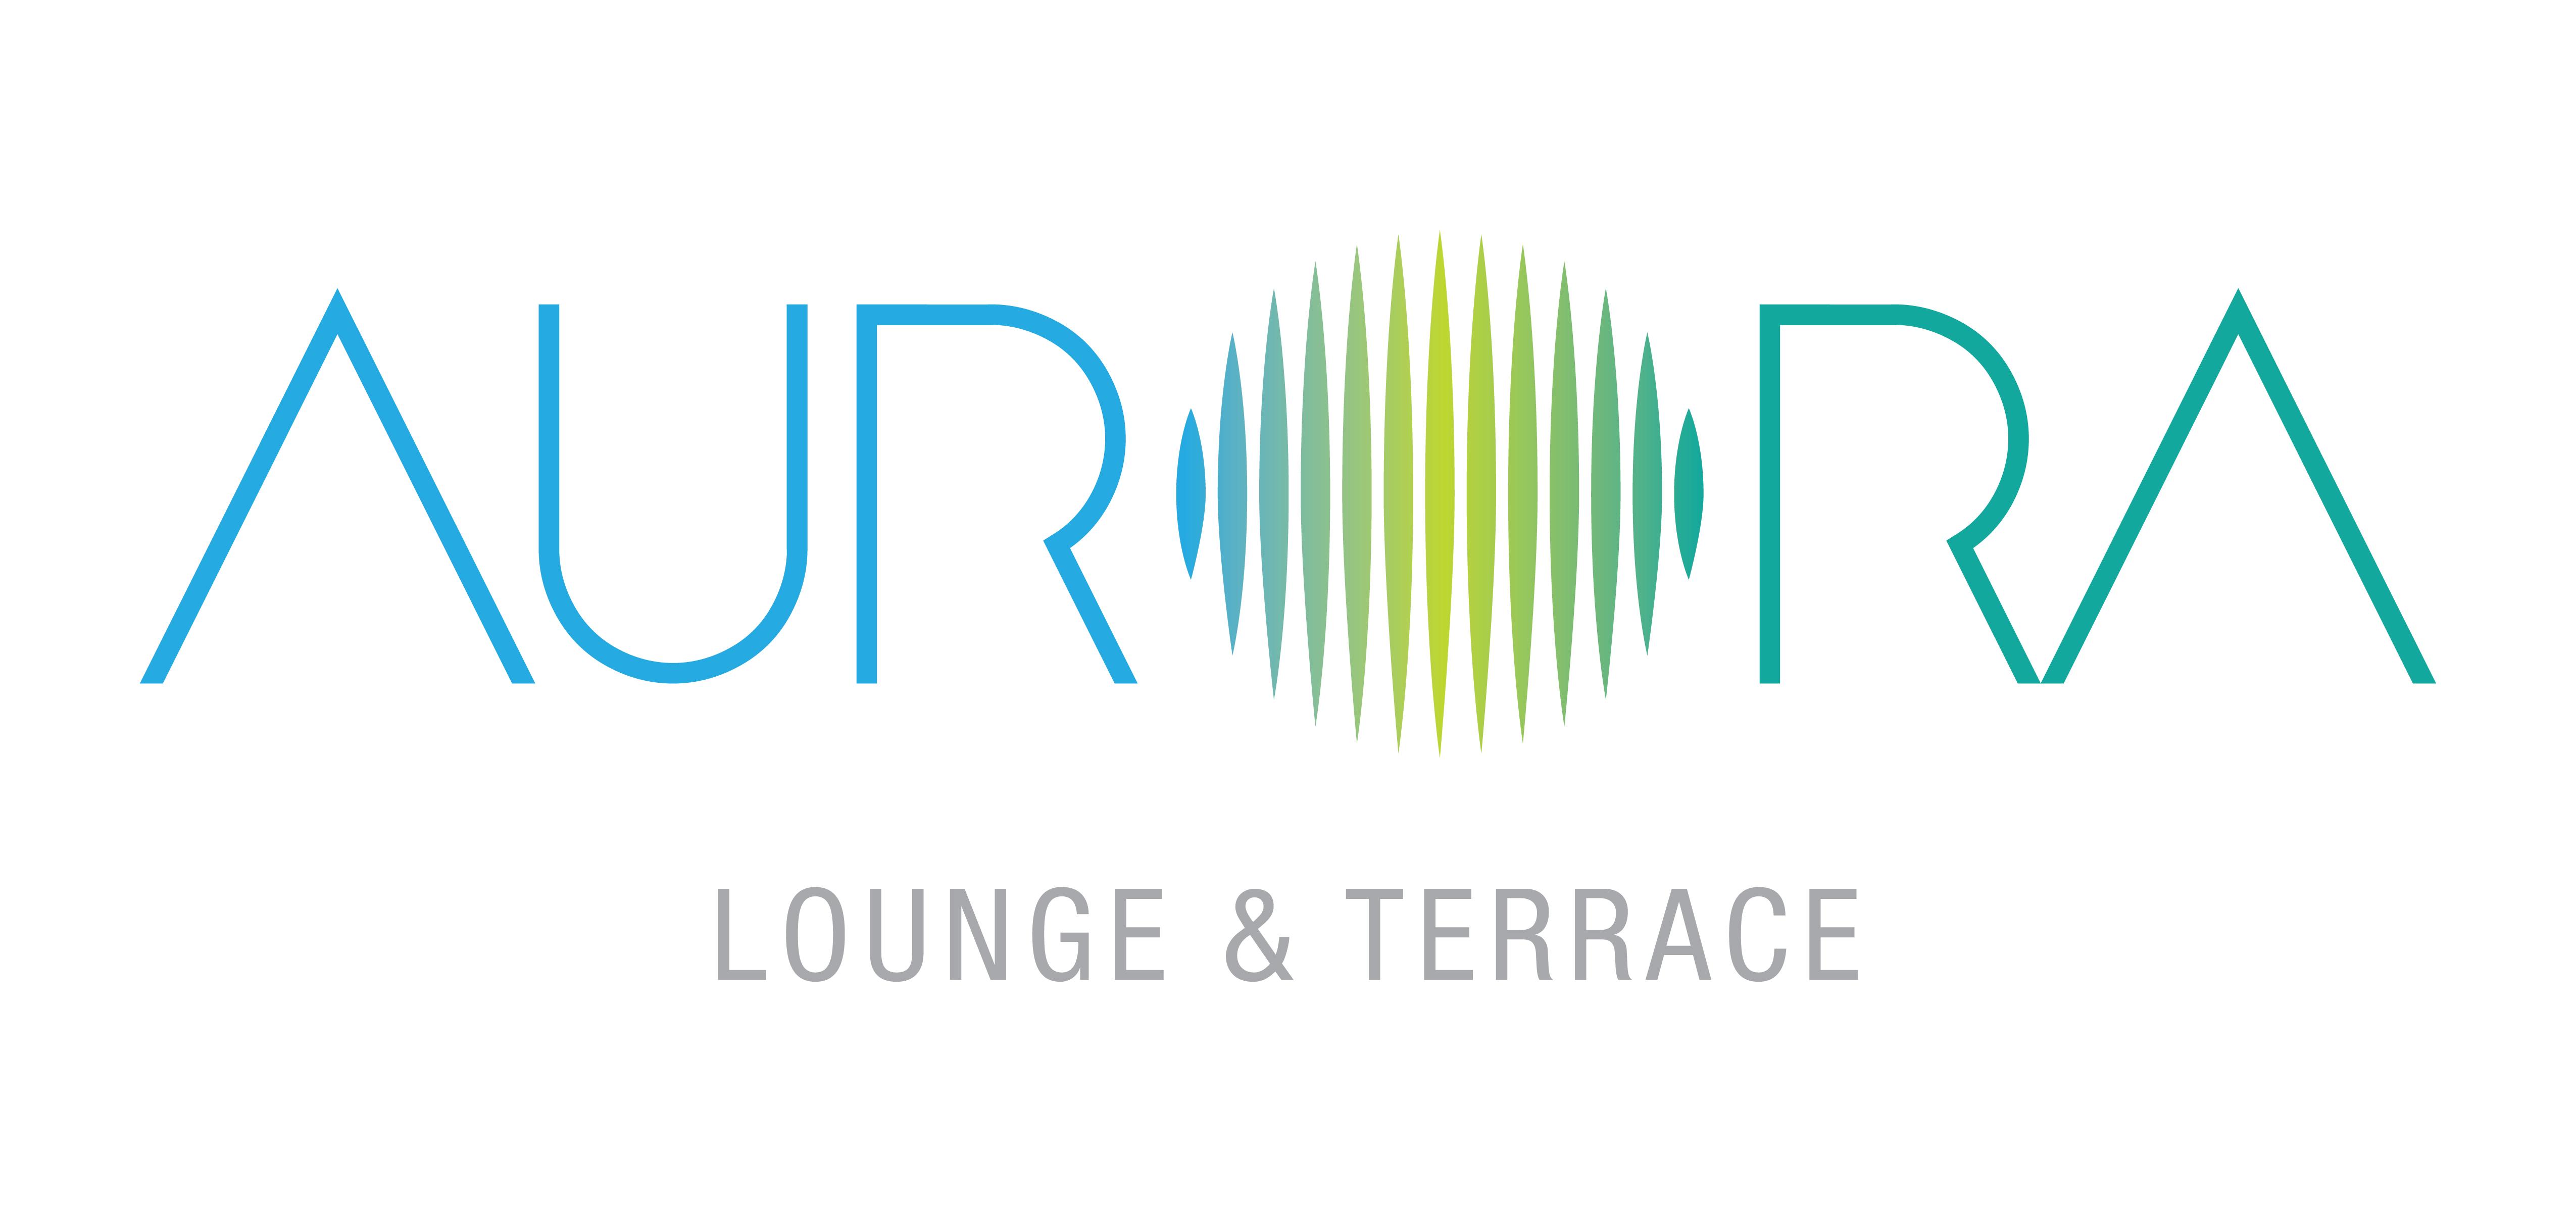 Aurora Lounge & Terrace